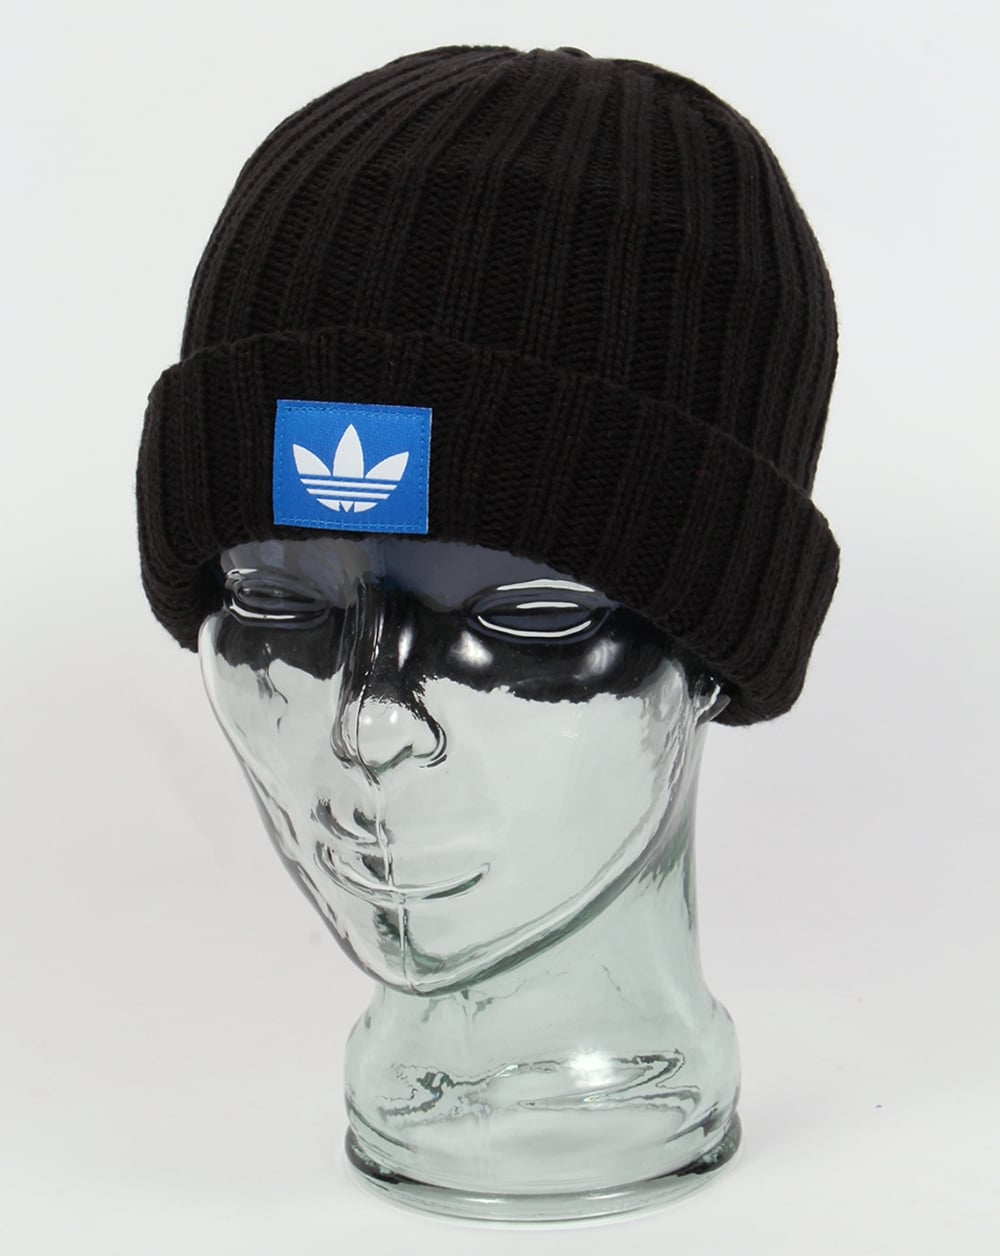 adidas Originals Adidas Originals FM Trefoil Beanie Black 6b3c0b13ac6